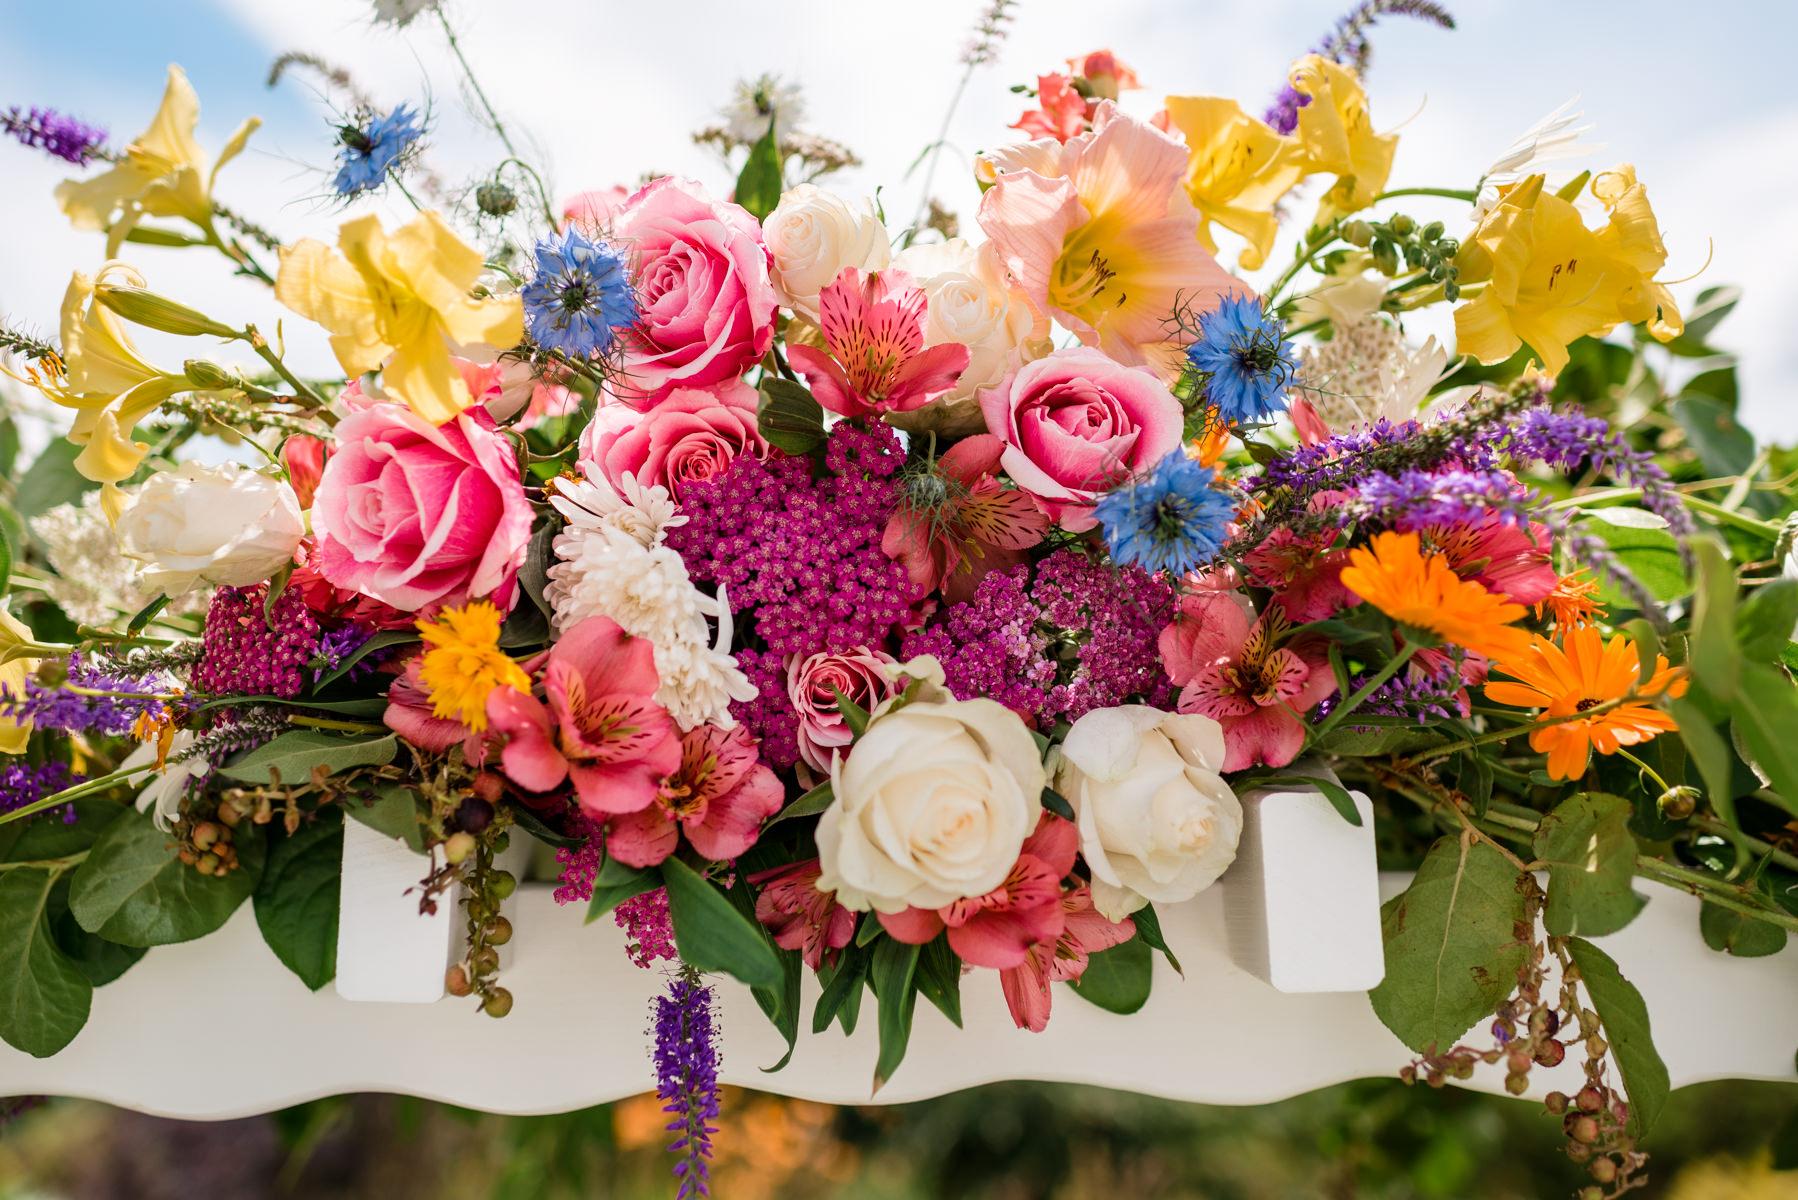 Andrew Tat - Documentary Wedding Photography - Kirkland, Washington - Emily & Cuauh - 02.JPG